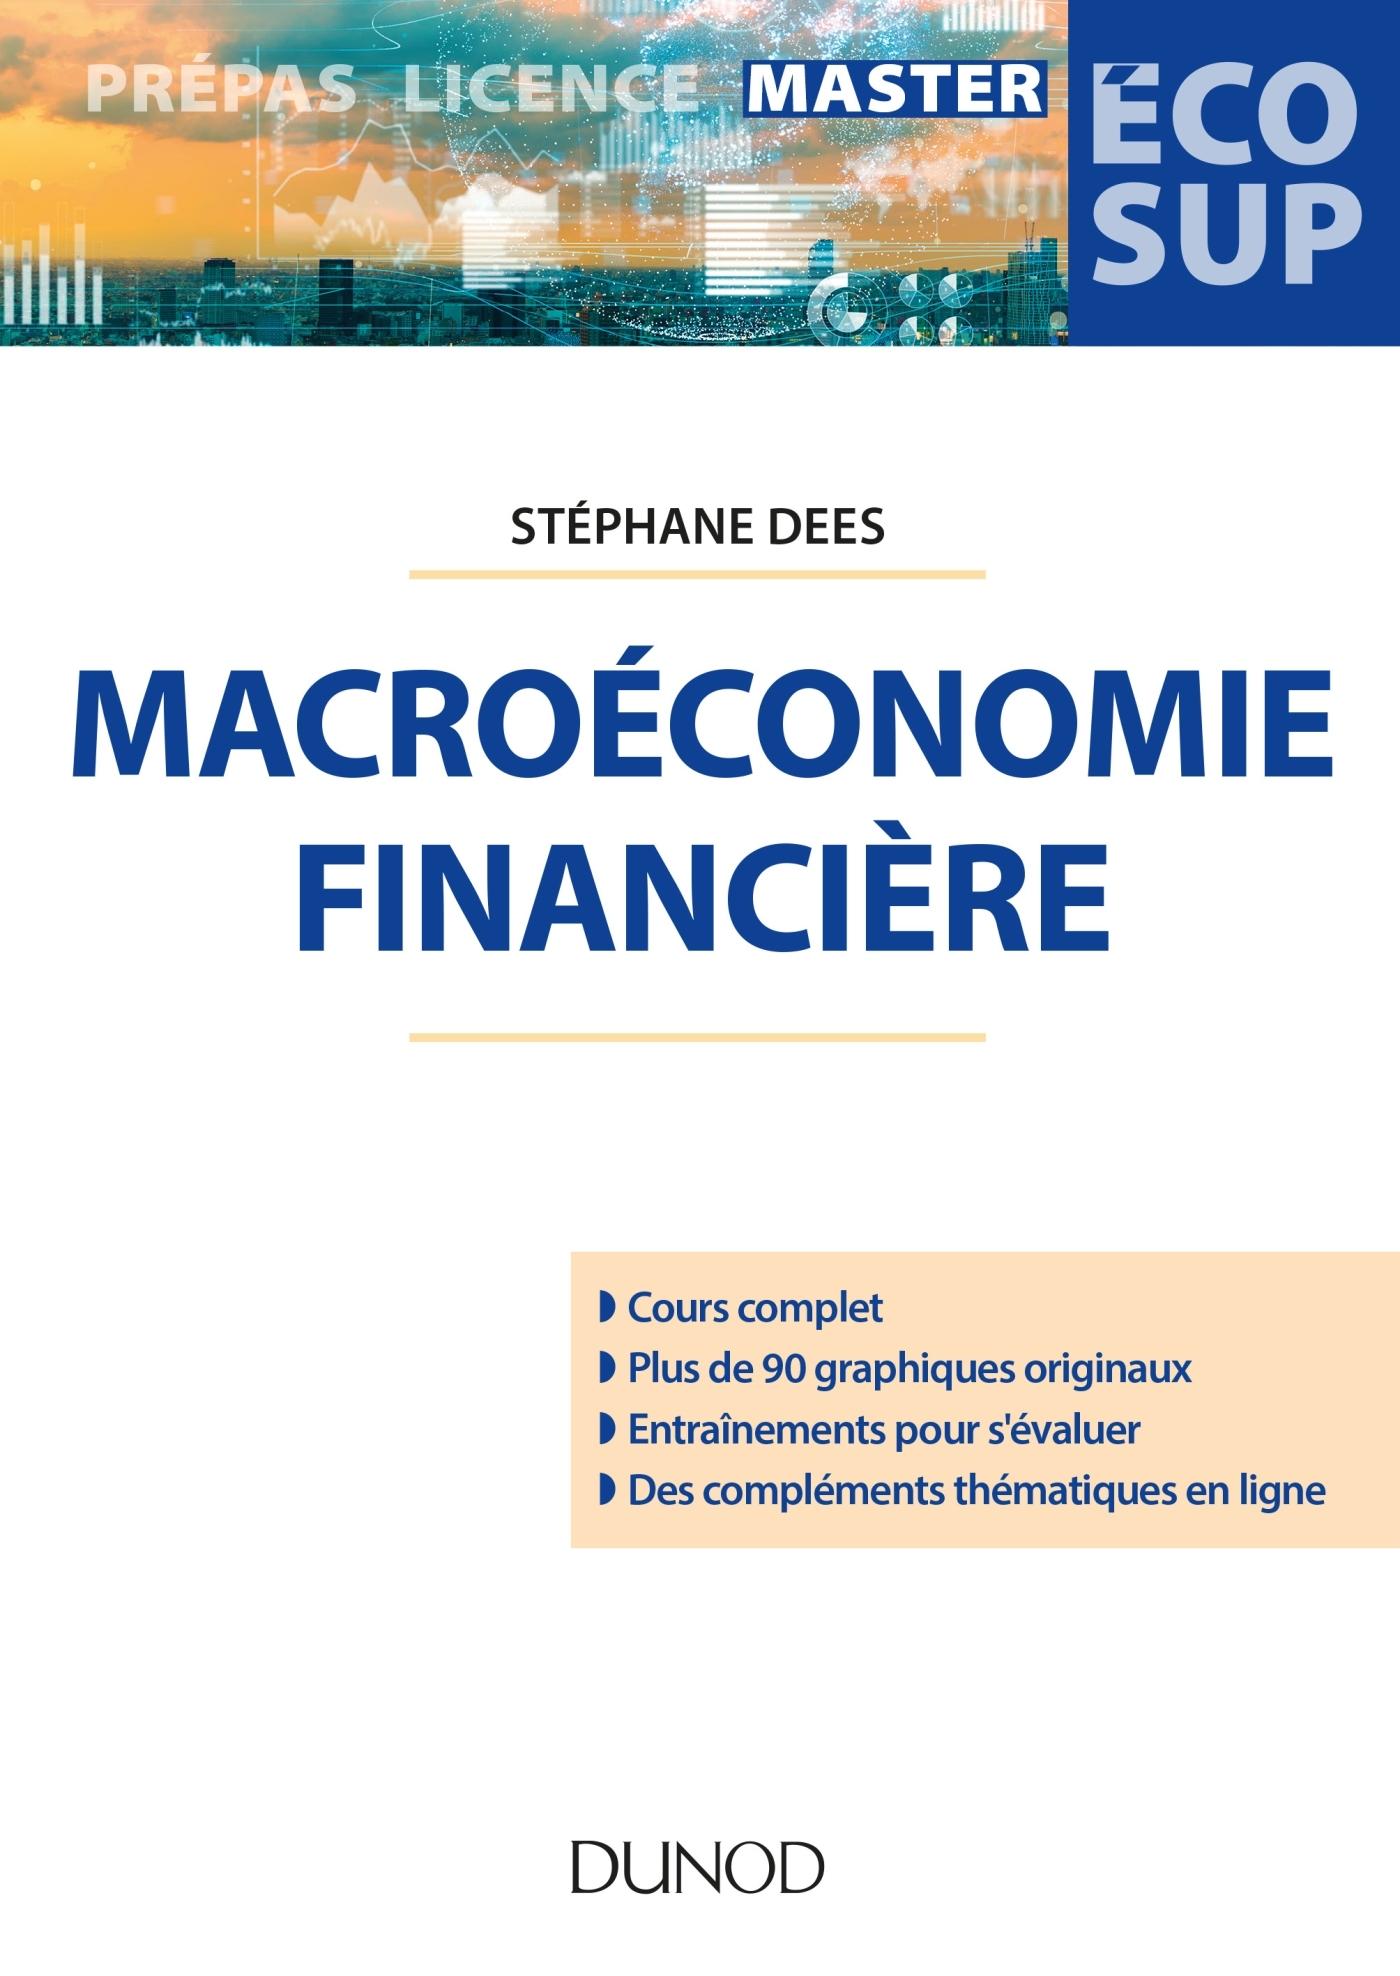 MACROECONOMIE FINANCIERE